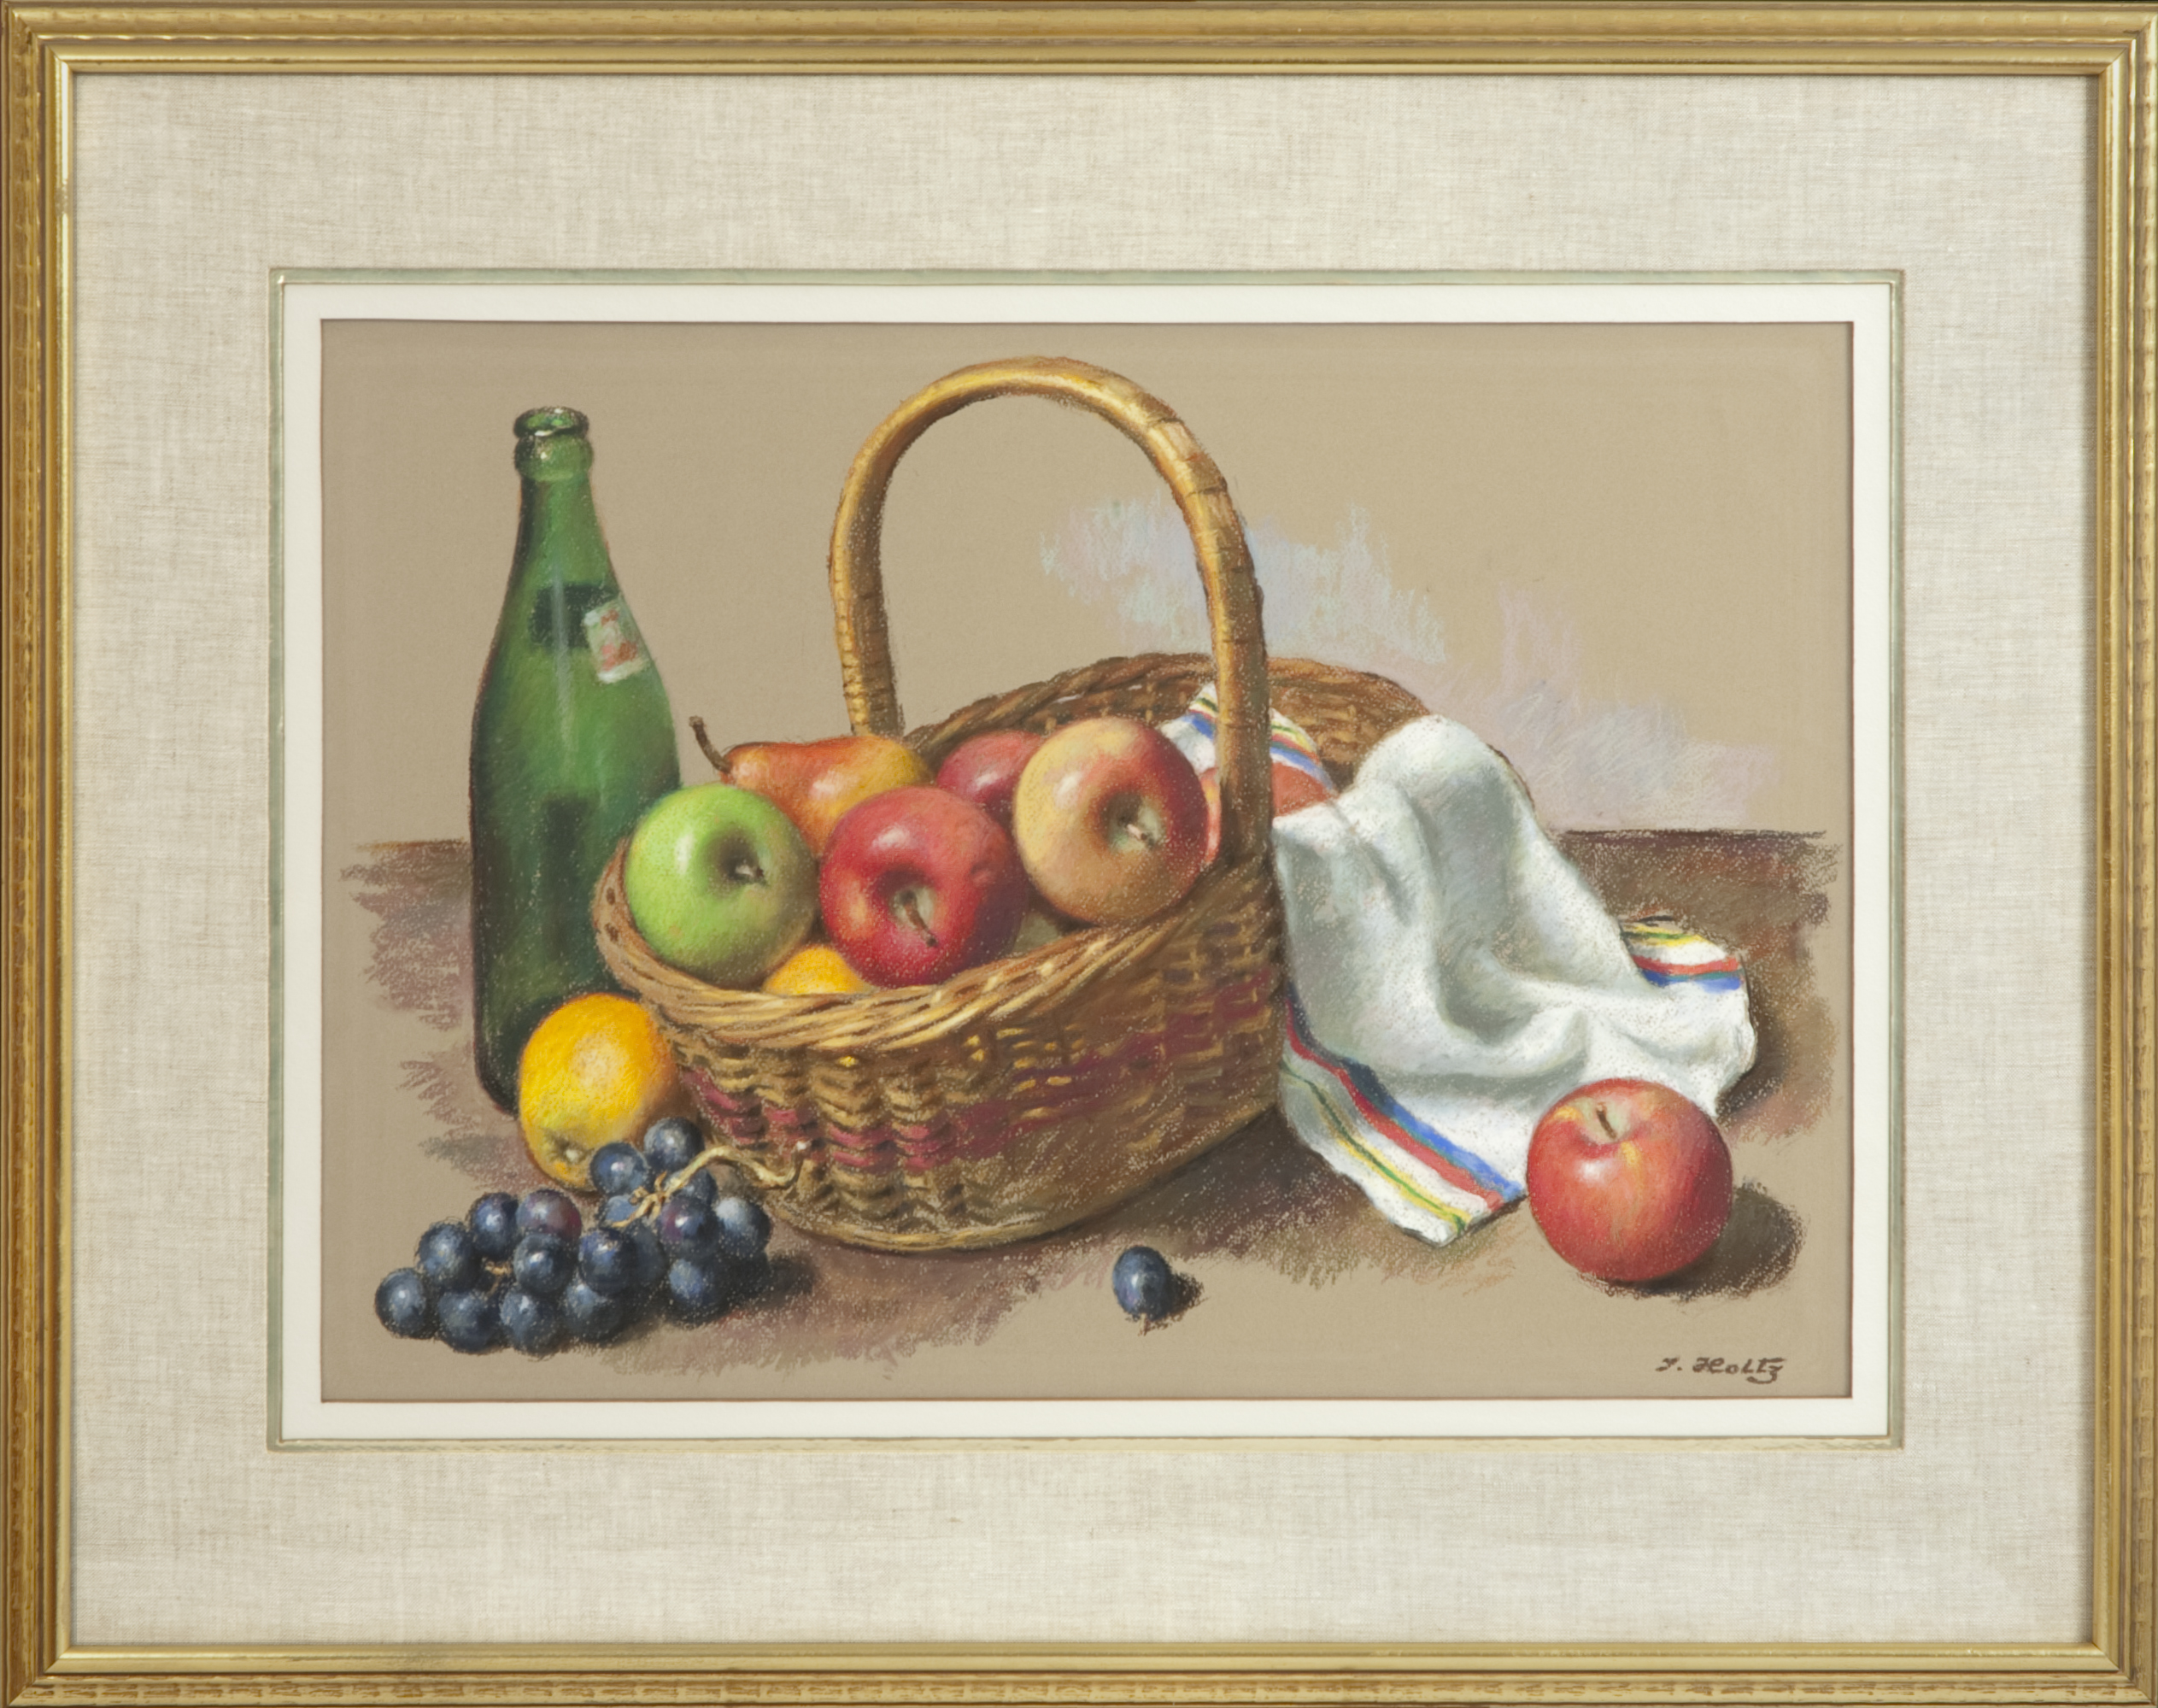 250 Basket with Fruit 1961 - Pastel - 23.5 x 16.5 - Frame: 33.625 x 26.75 x 1.25